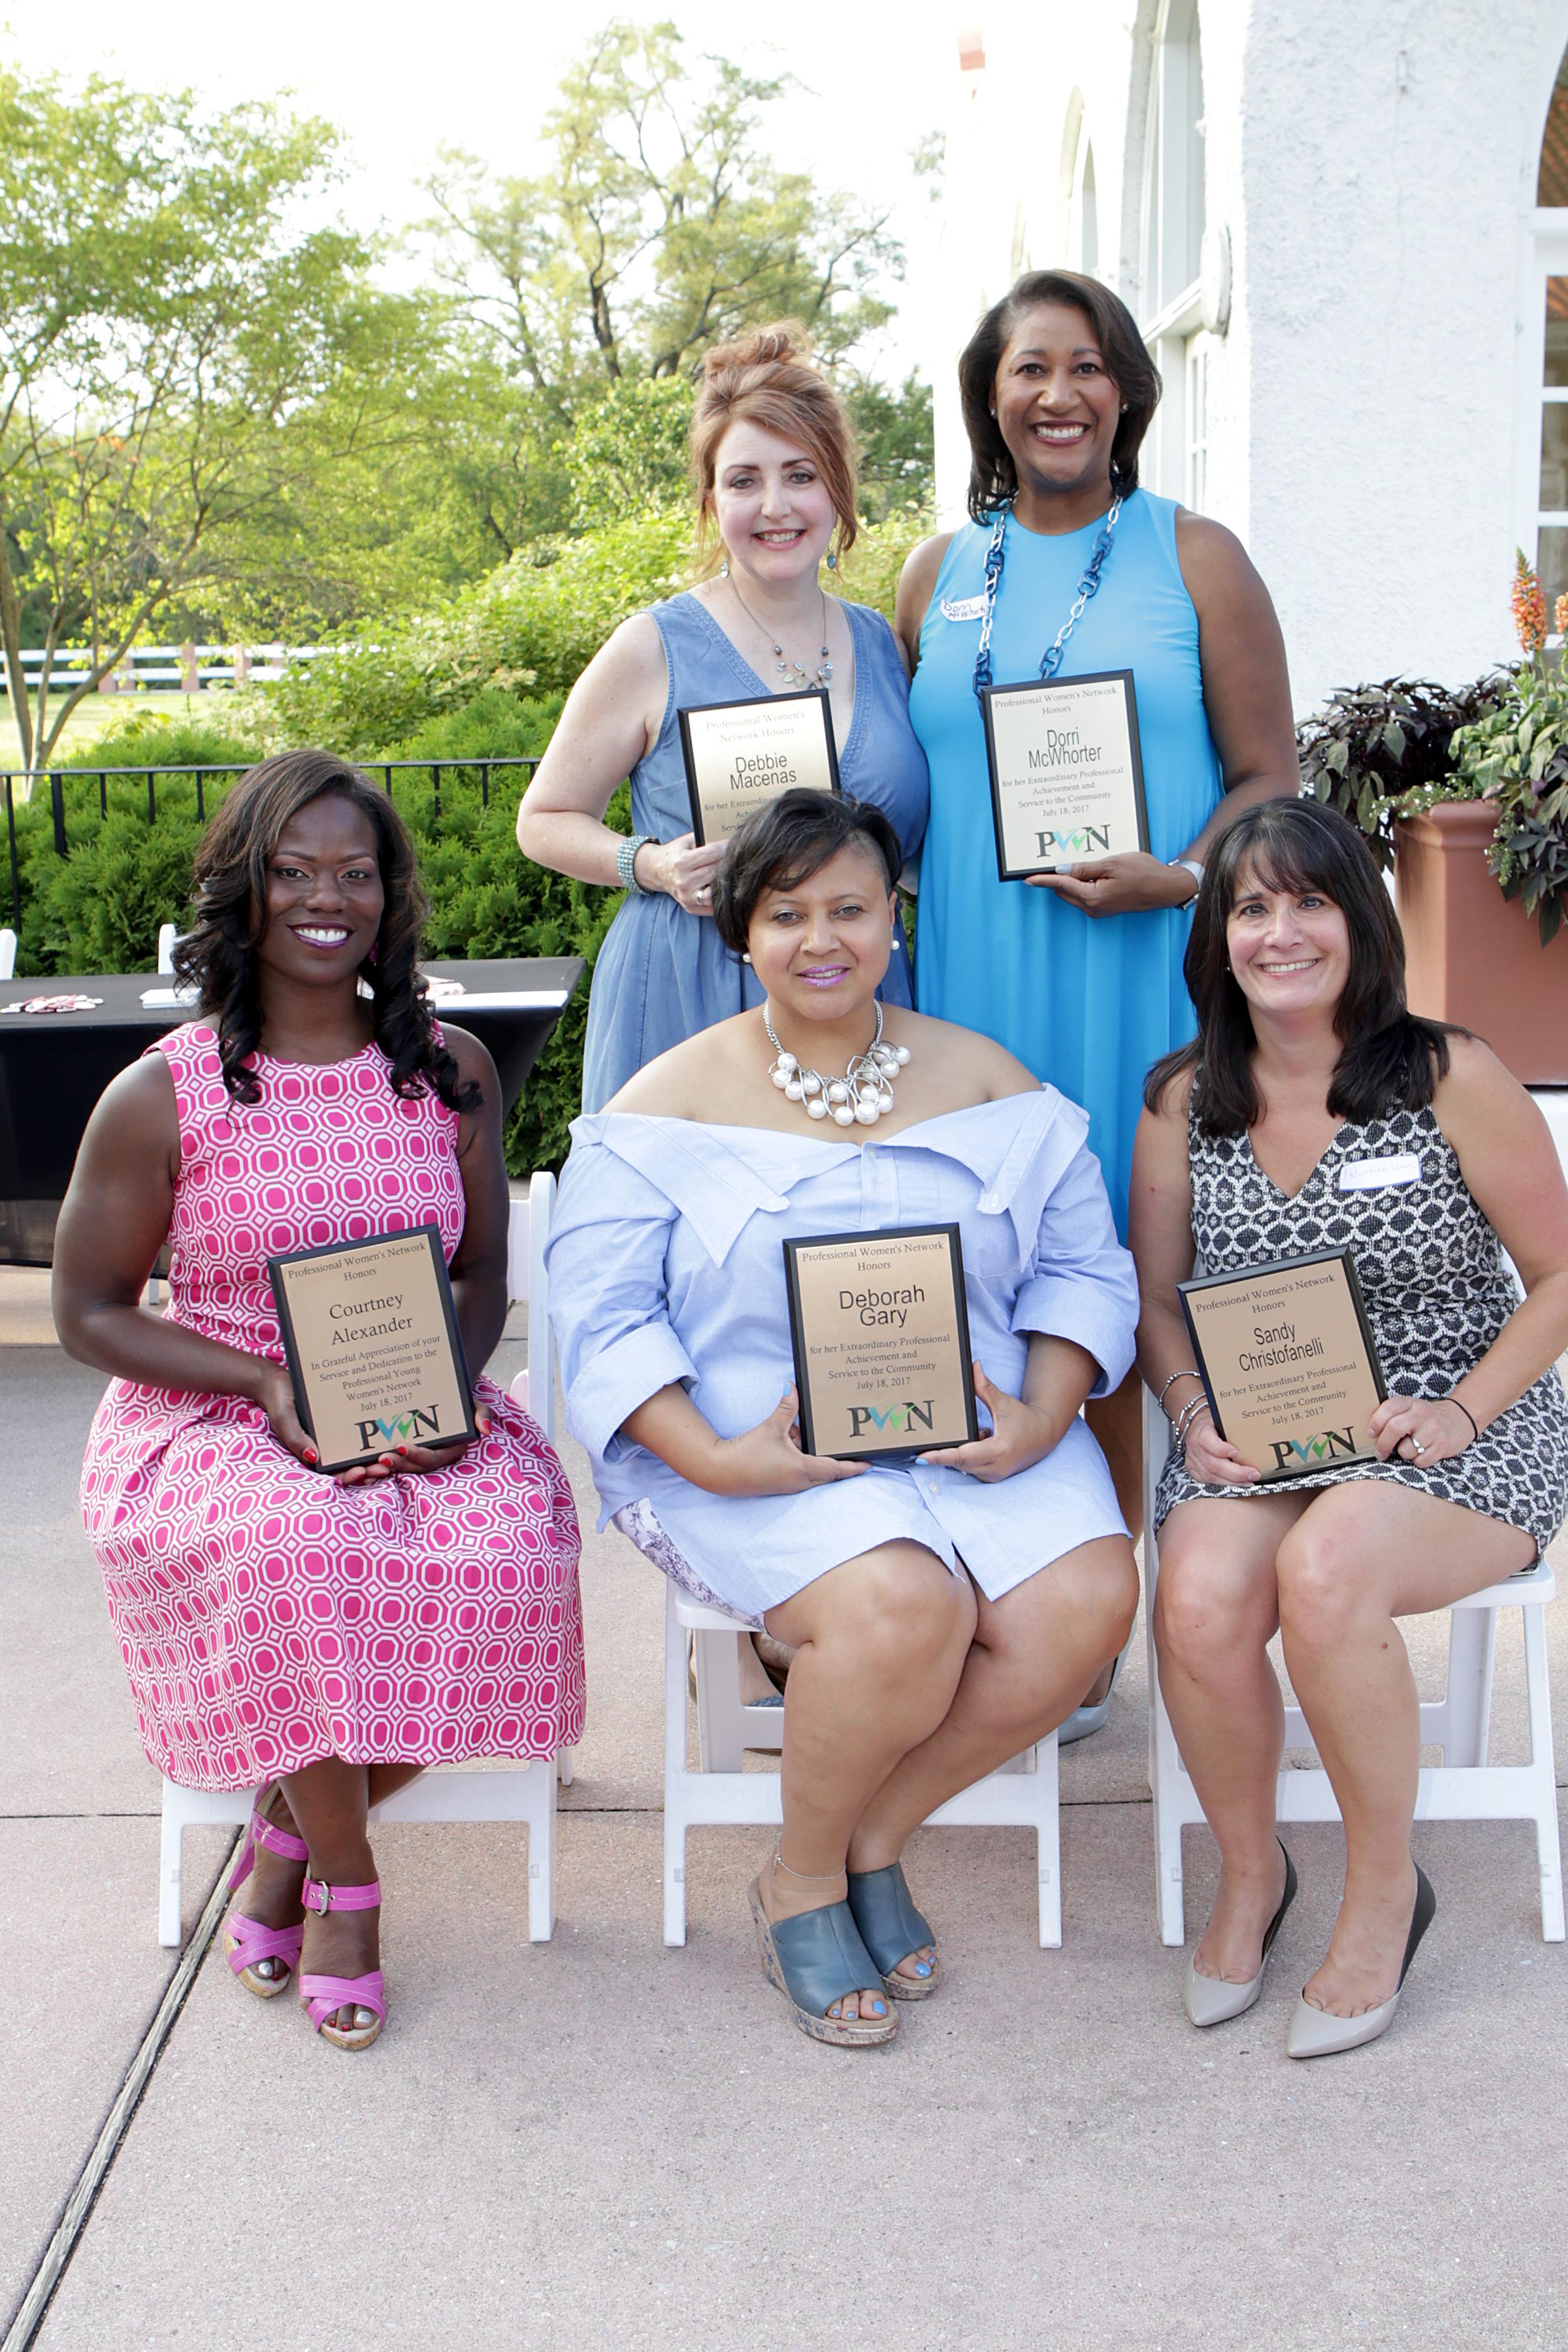 PWN Honors Five Women at 2017 Summer Soirée